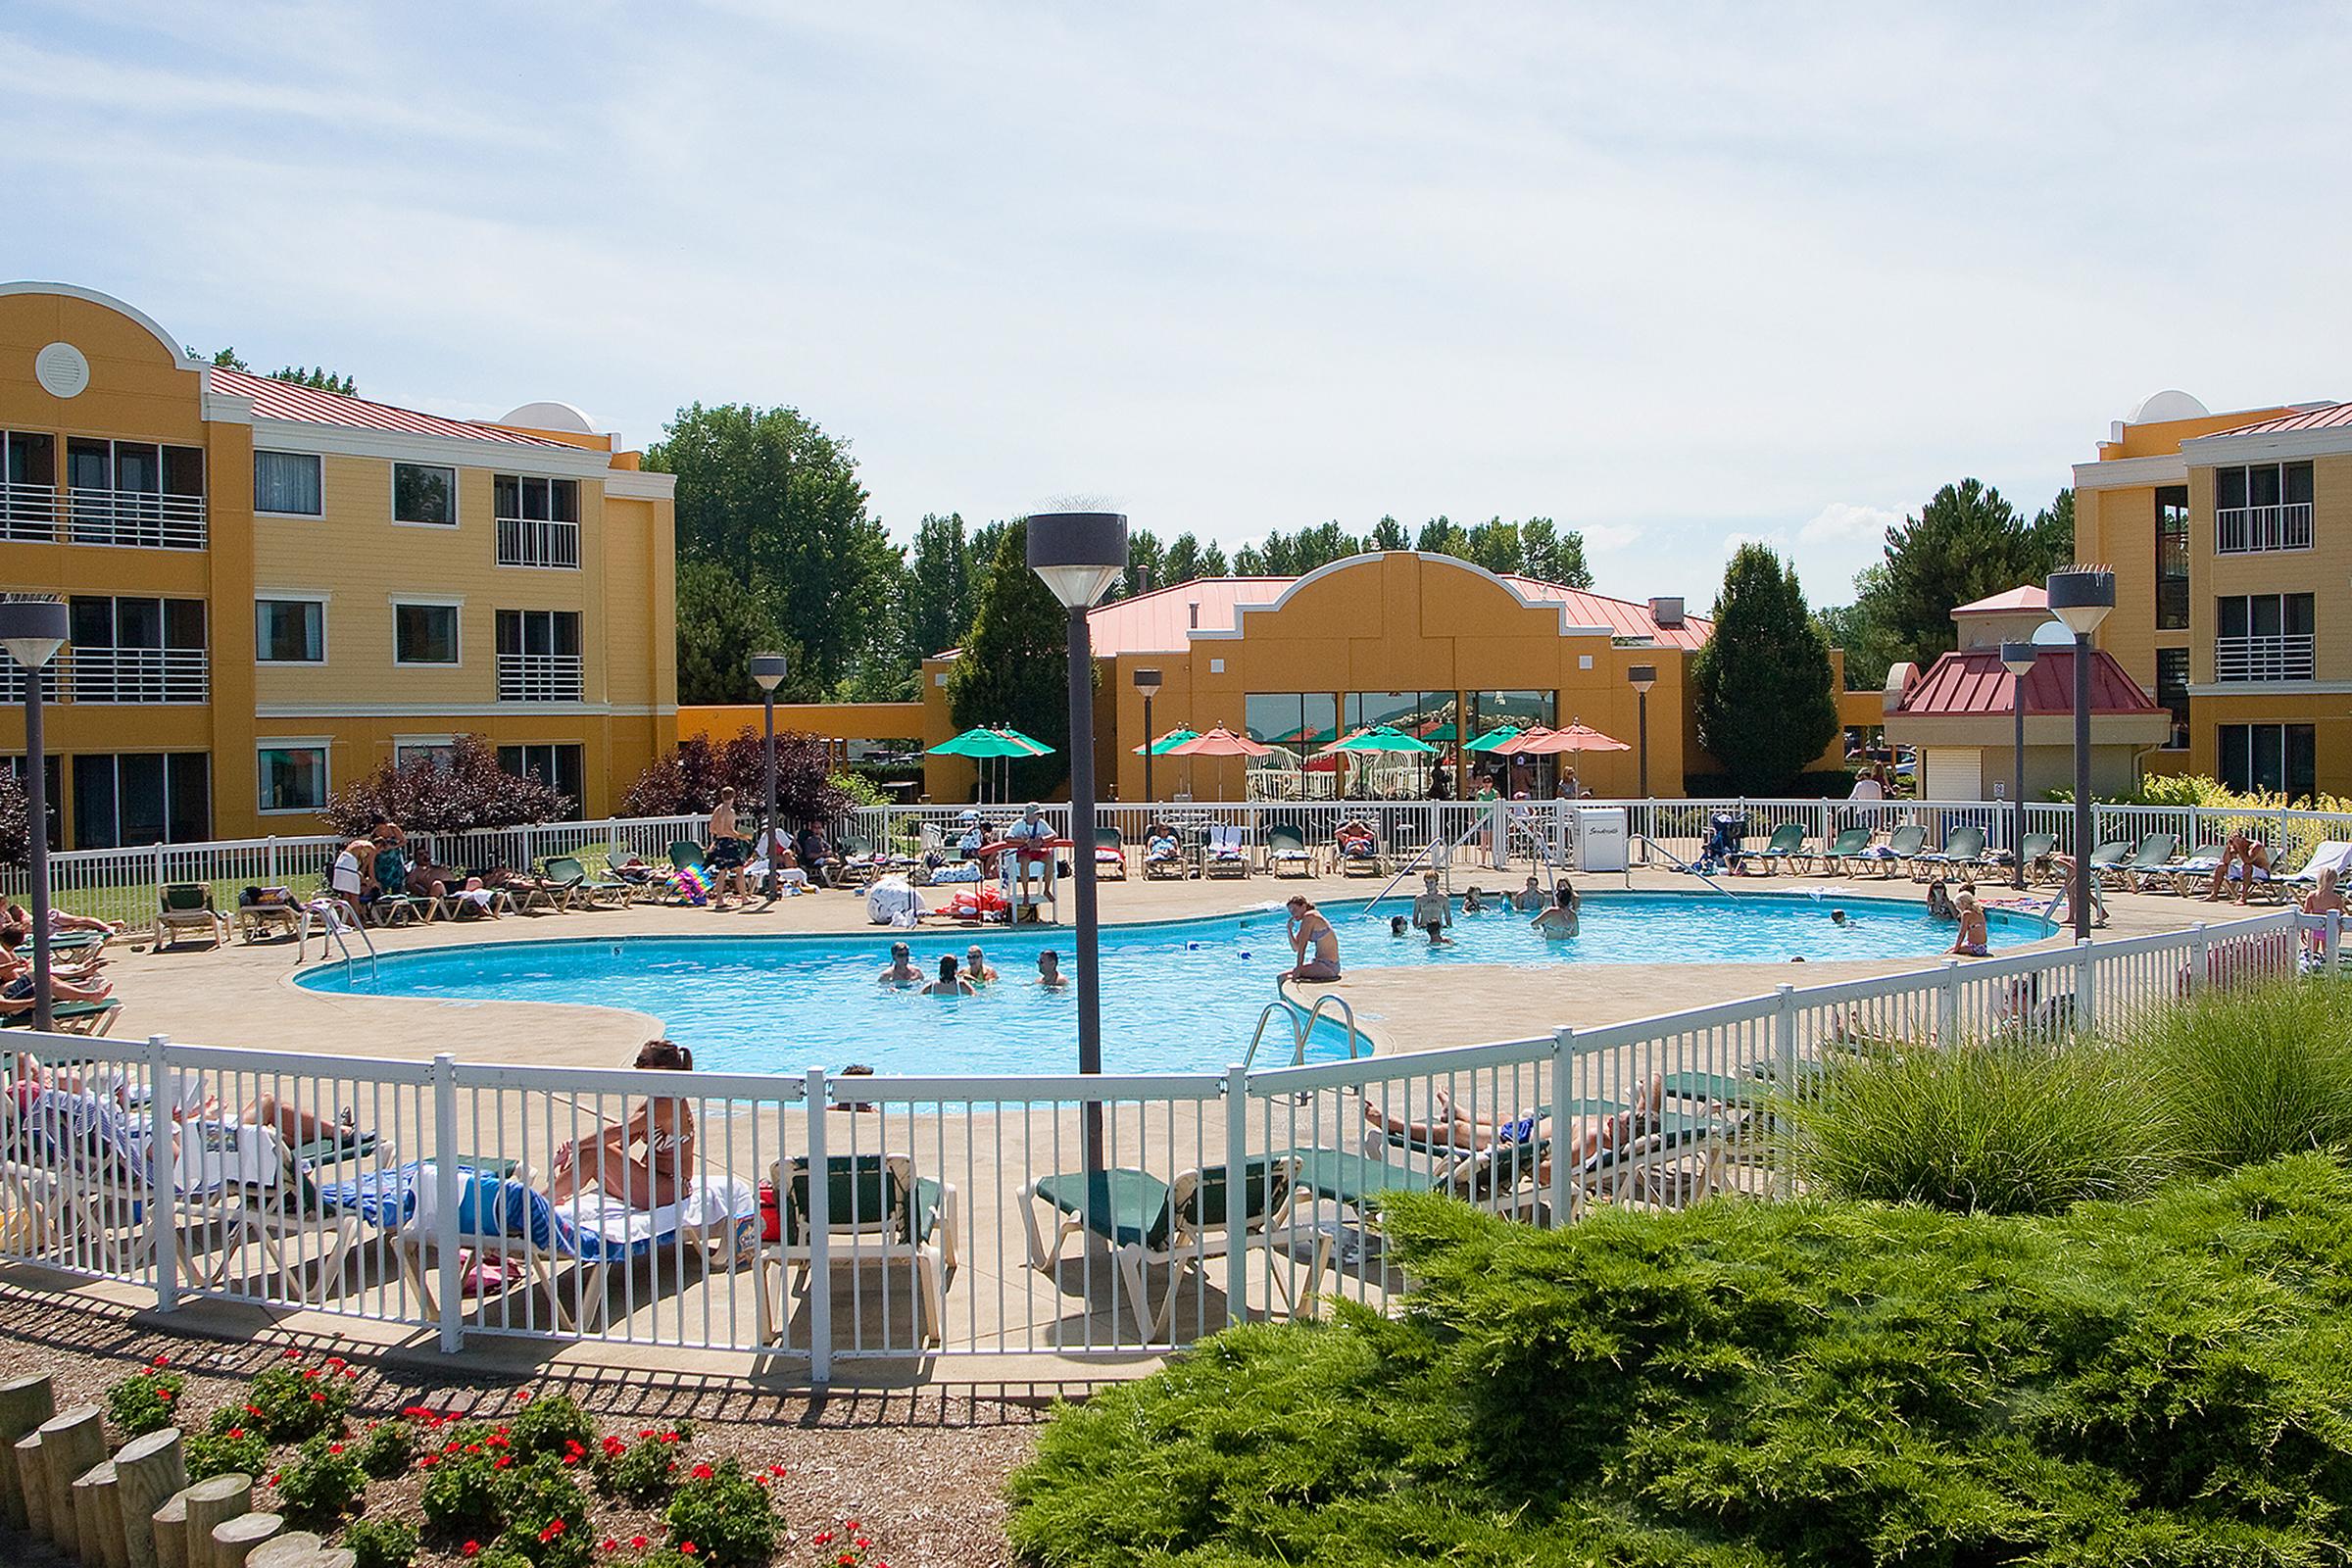 Cedar Point To Tear Down Hotel Sports Venue The Blade